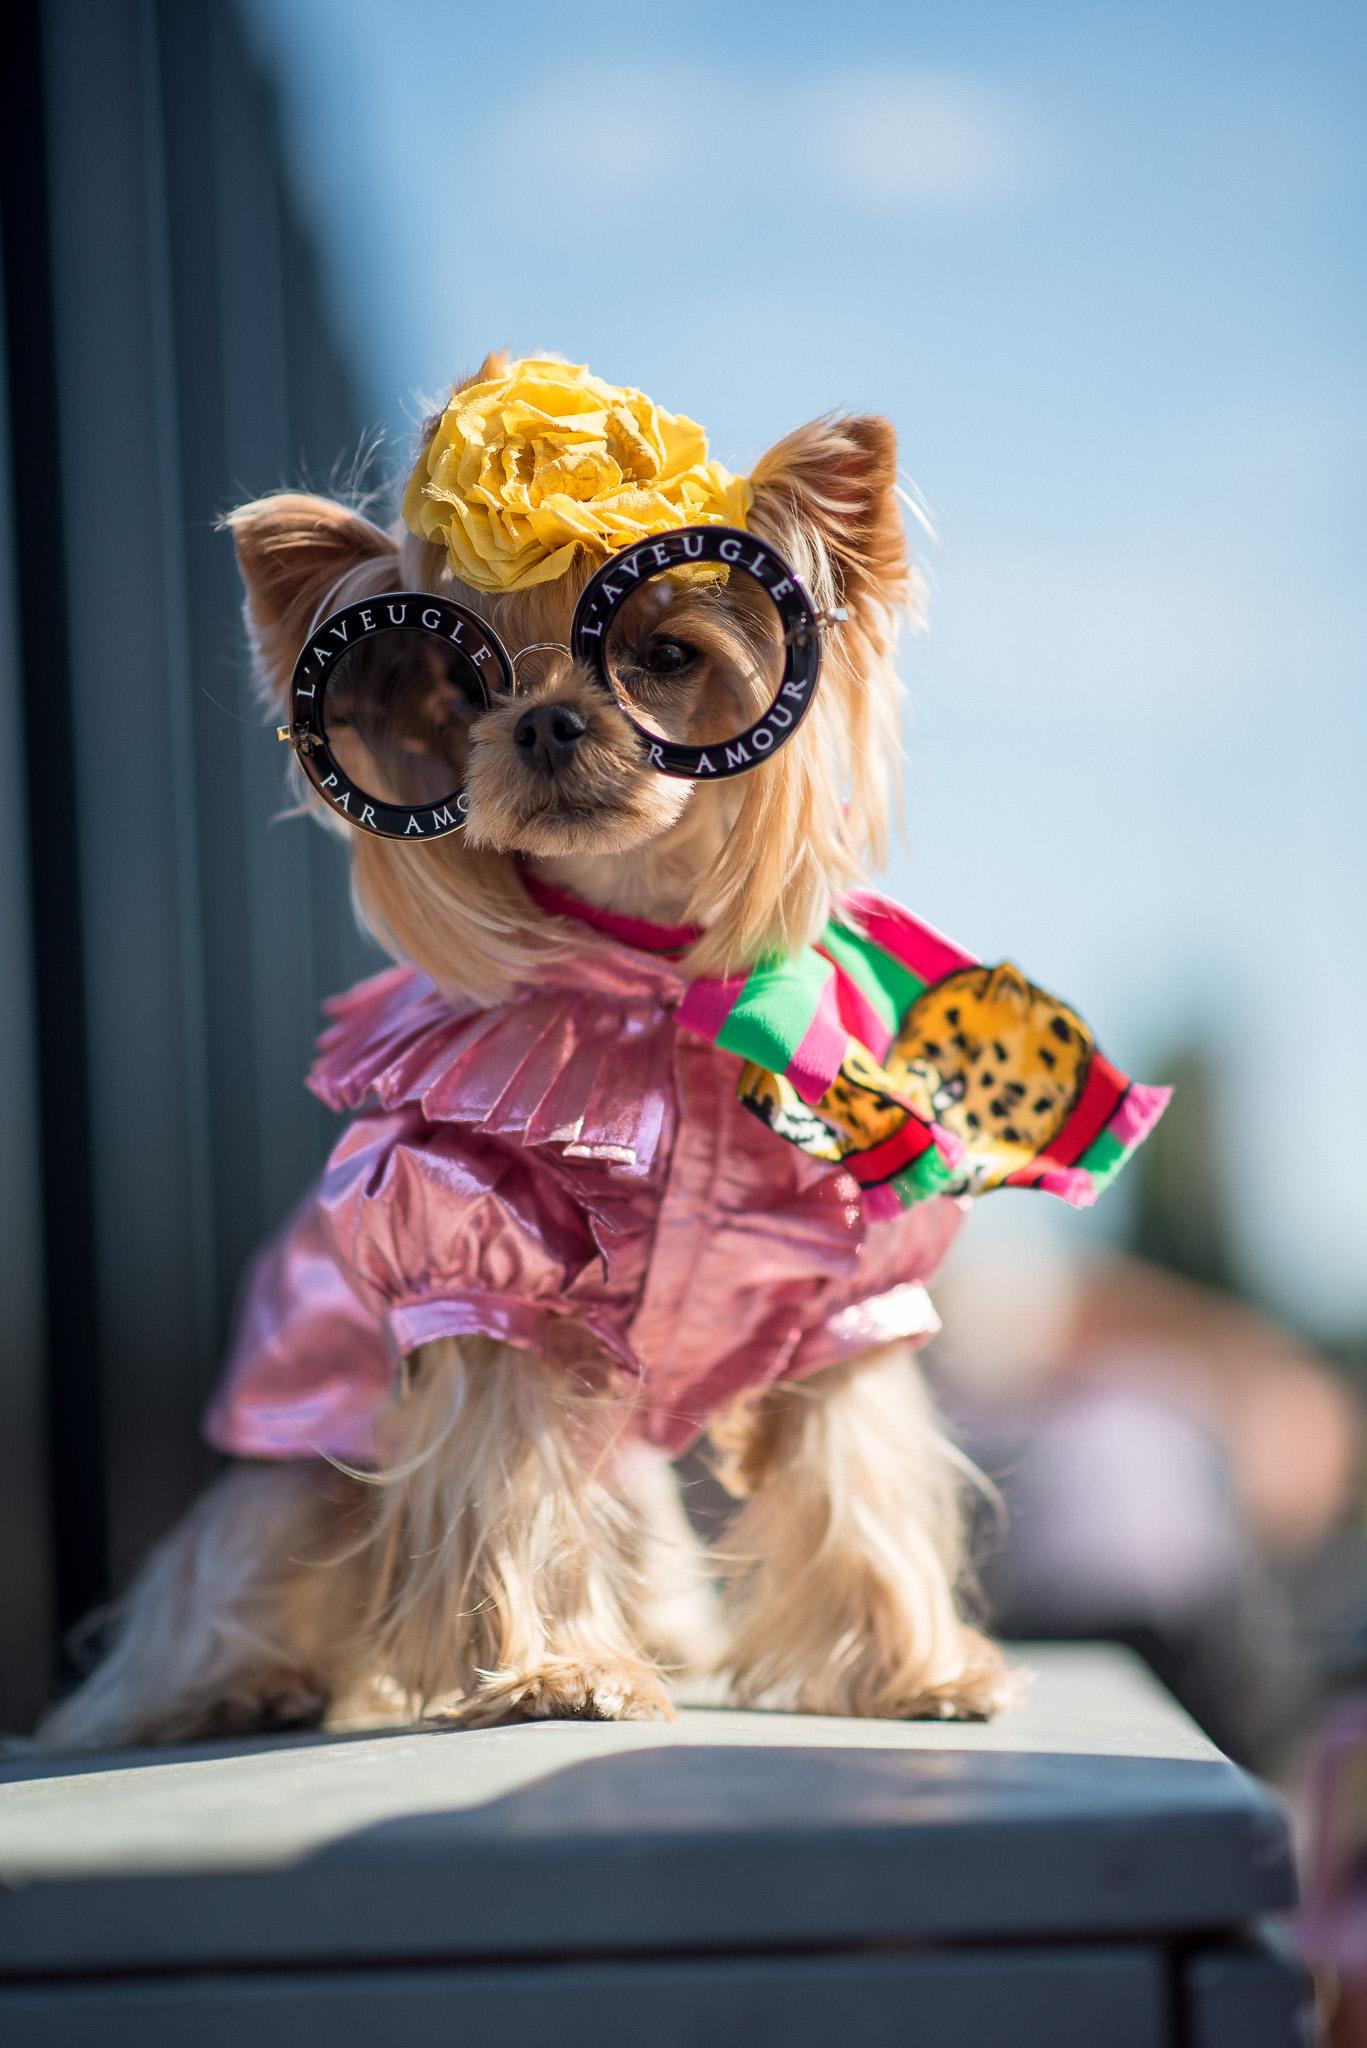 Little Lola Sunshine Gucci Milan Fashion Week September 2017 Photography Annika Lagerqvist www.annikasomething.com